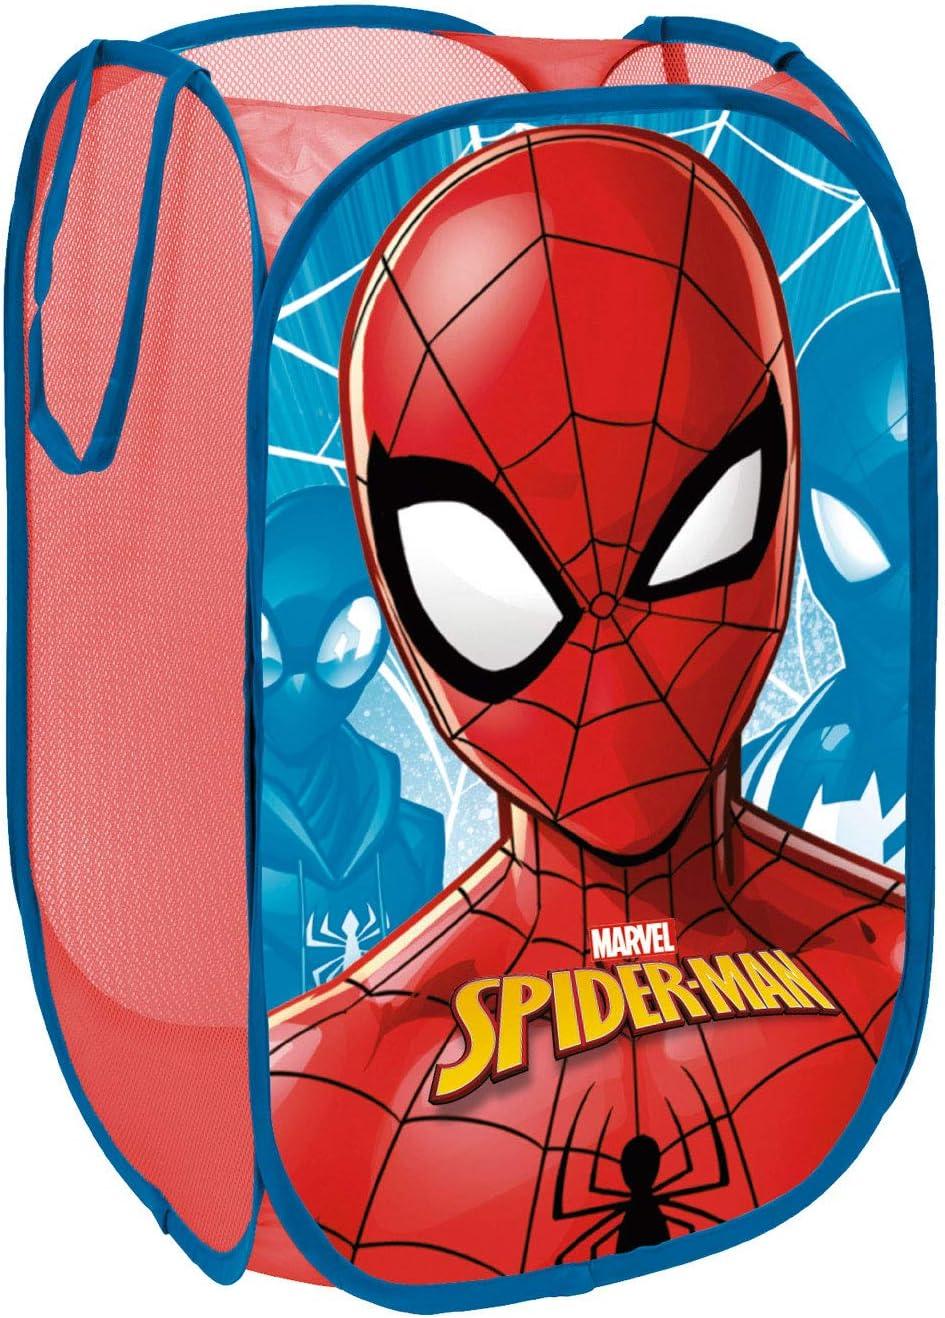 dise/ño Spiderman Arditex SM11589 Cesta pongotodo guarda juguetes